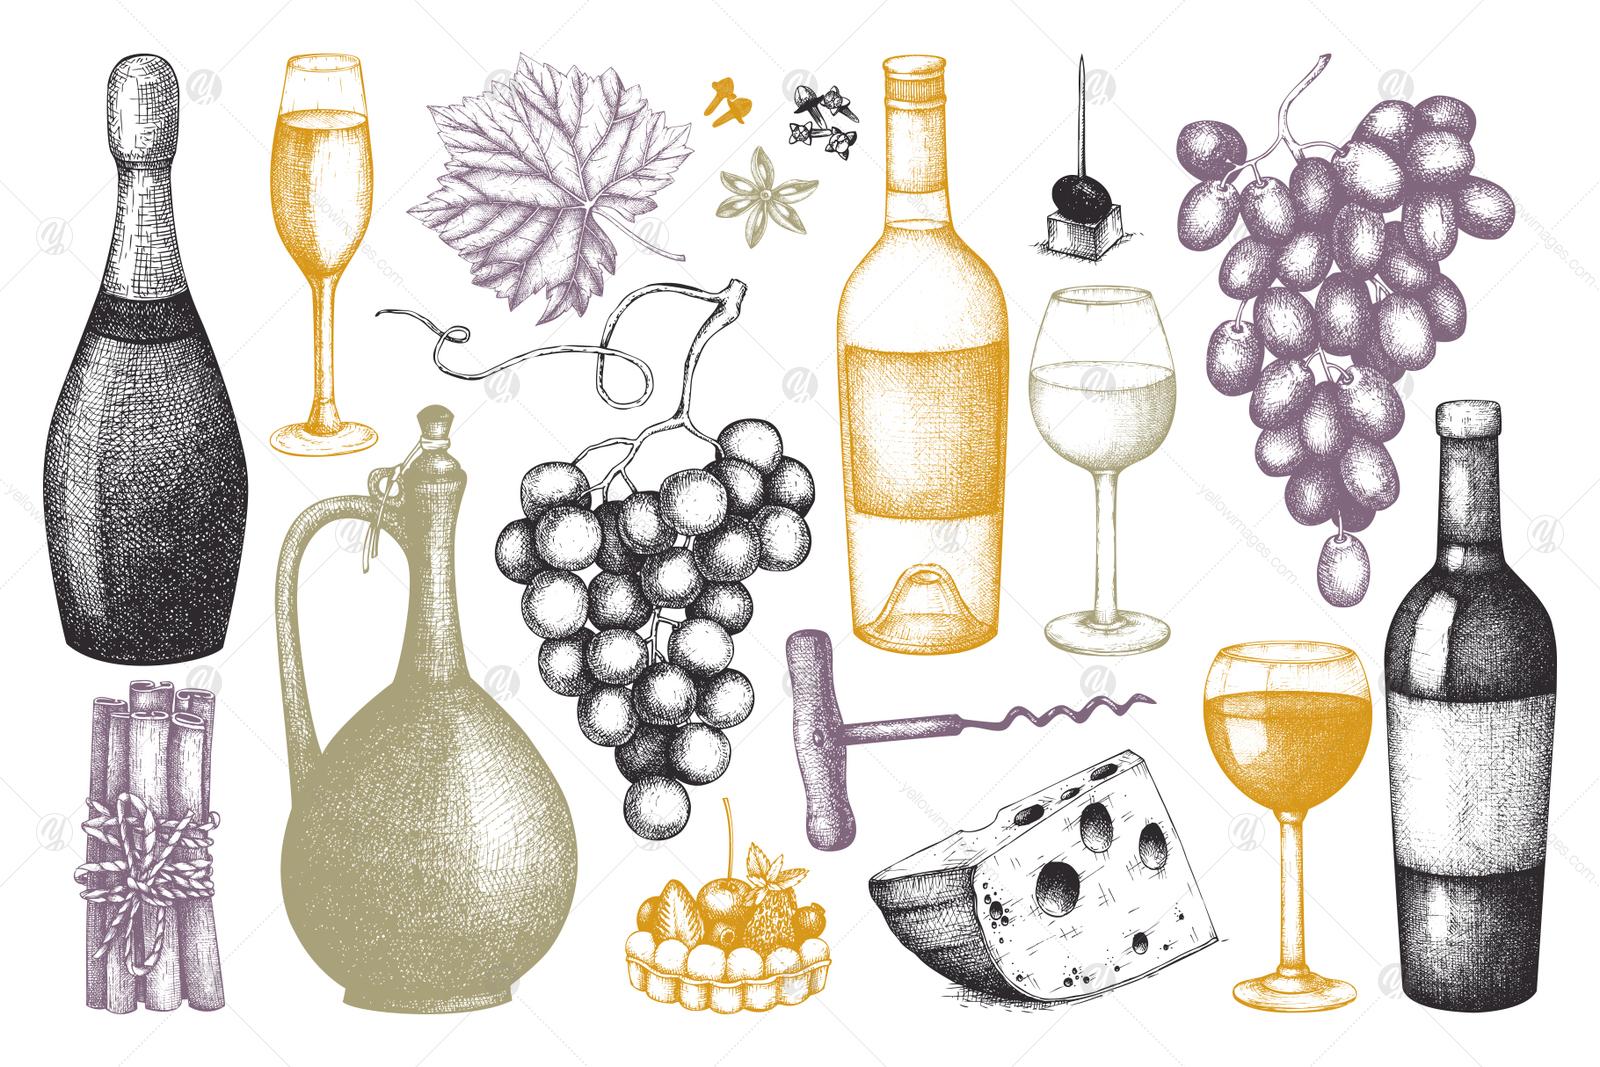 Red & White Wine Illustations Set